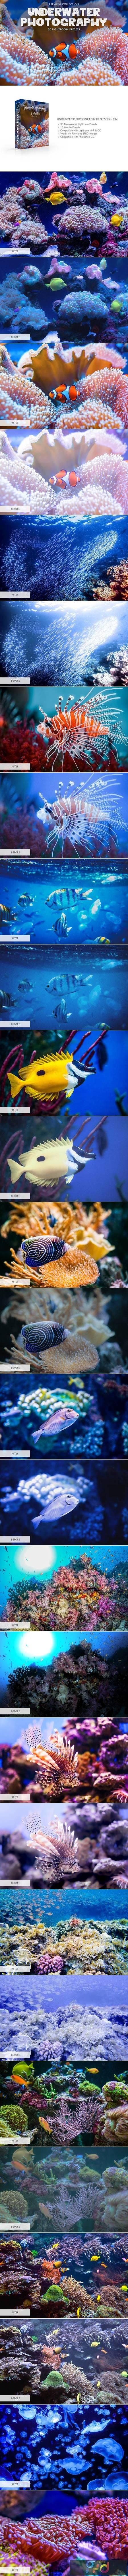 Underwater Photography Presets 4725471 1